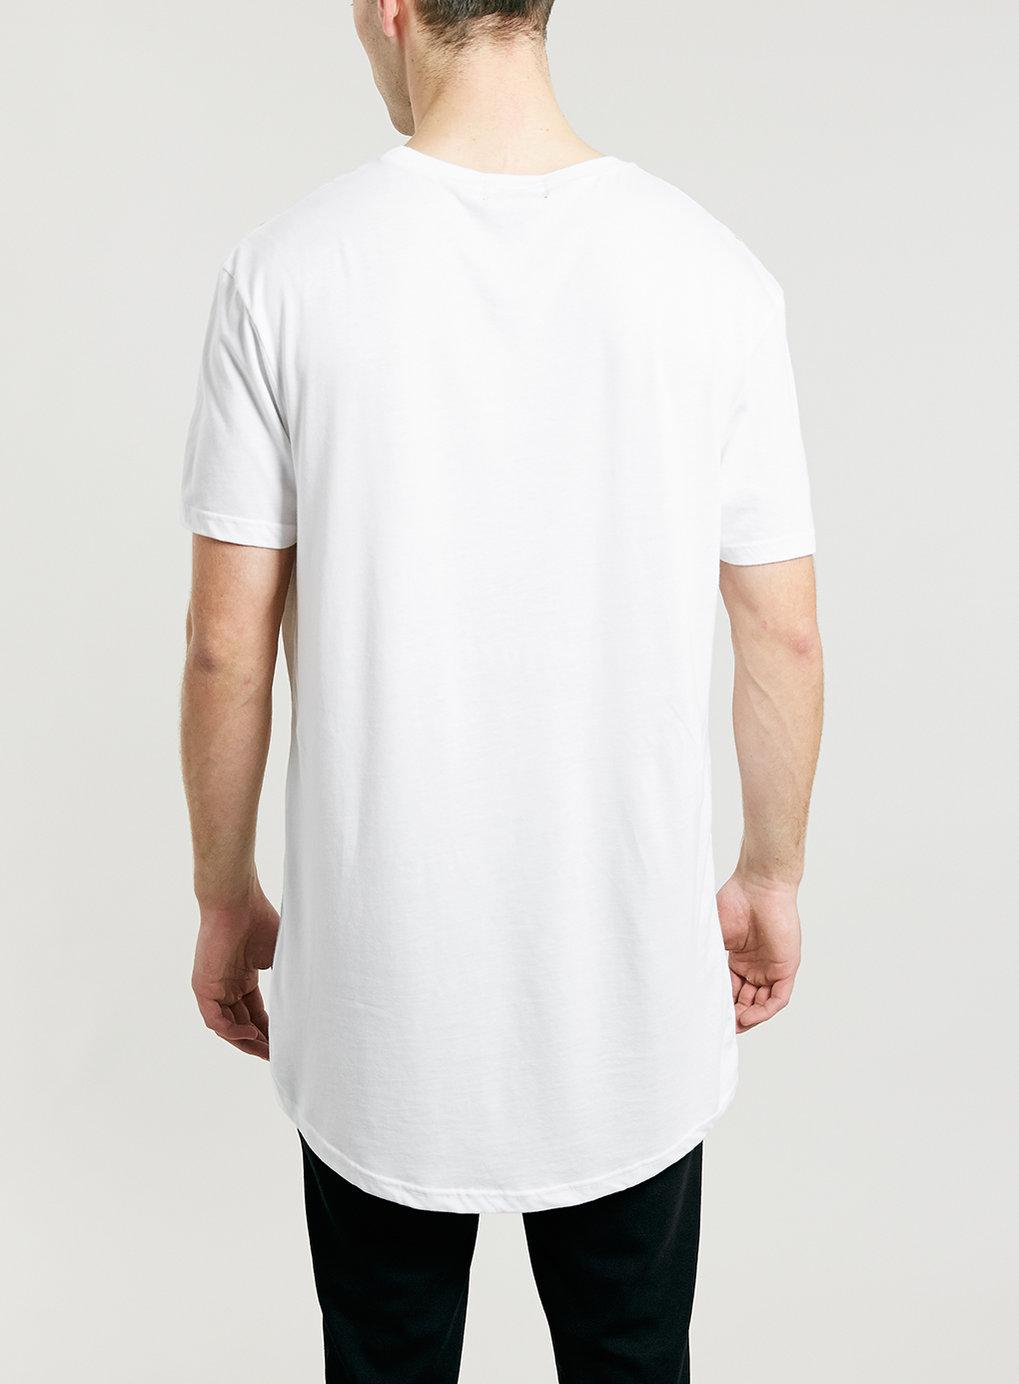 Bandana Shirts For Men